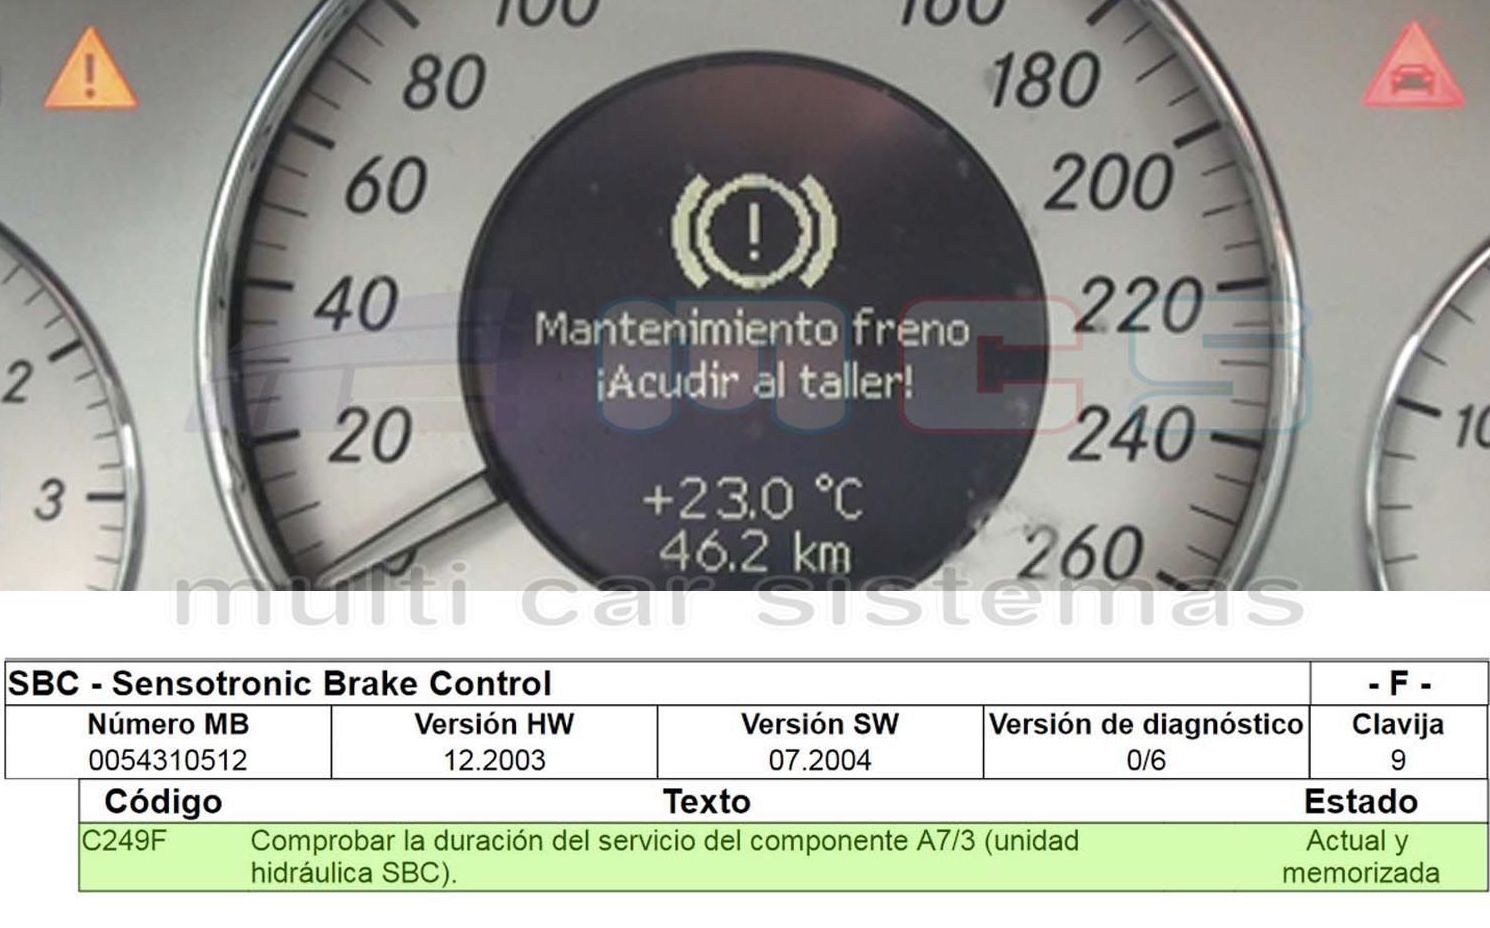 Fallo display cuadro error C249F SBC ABS Mercedes Benz E W211 CLS C219 SL R230 Mantenimiento freno